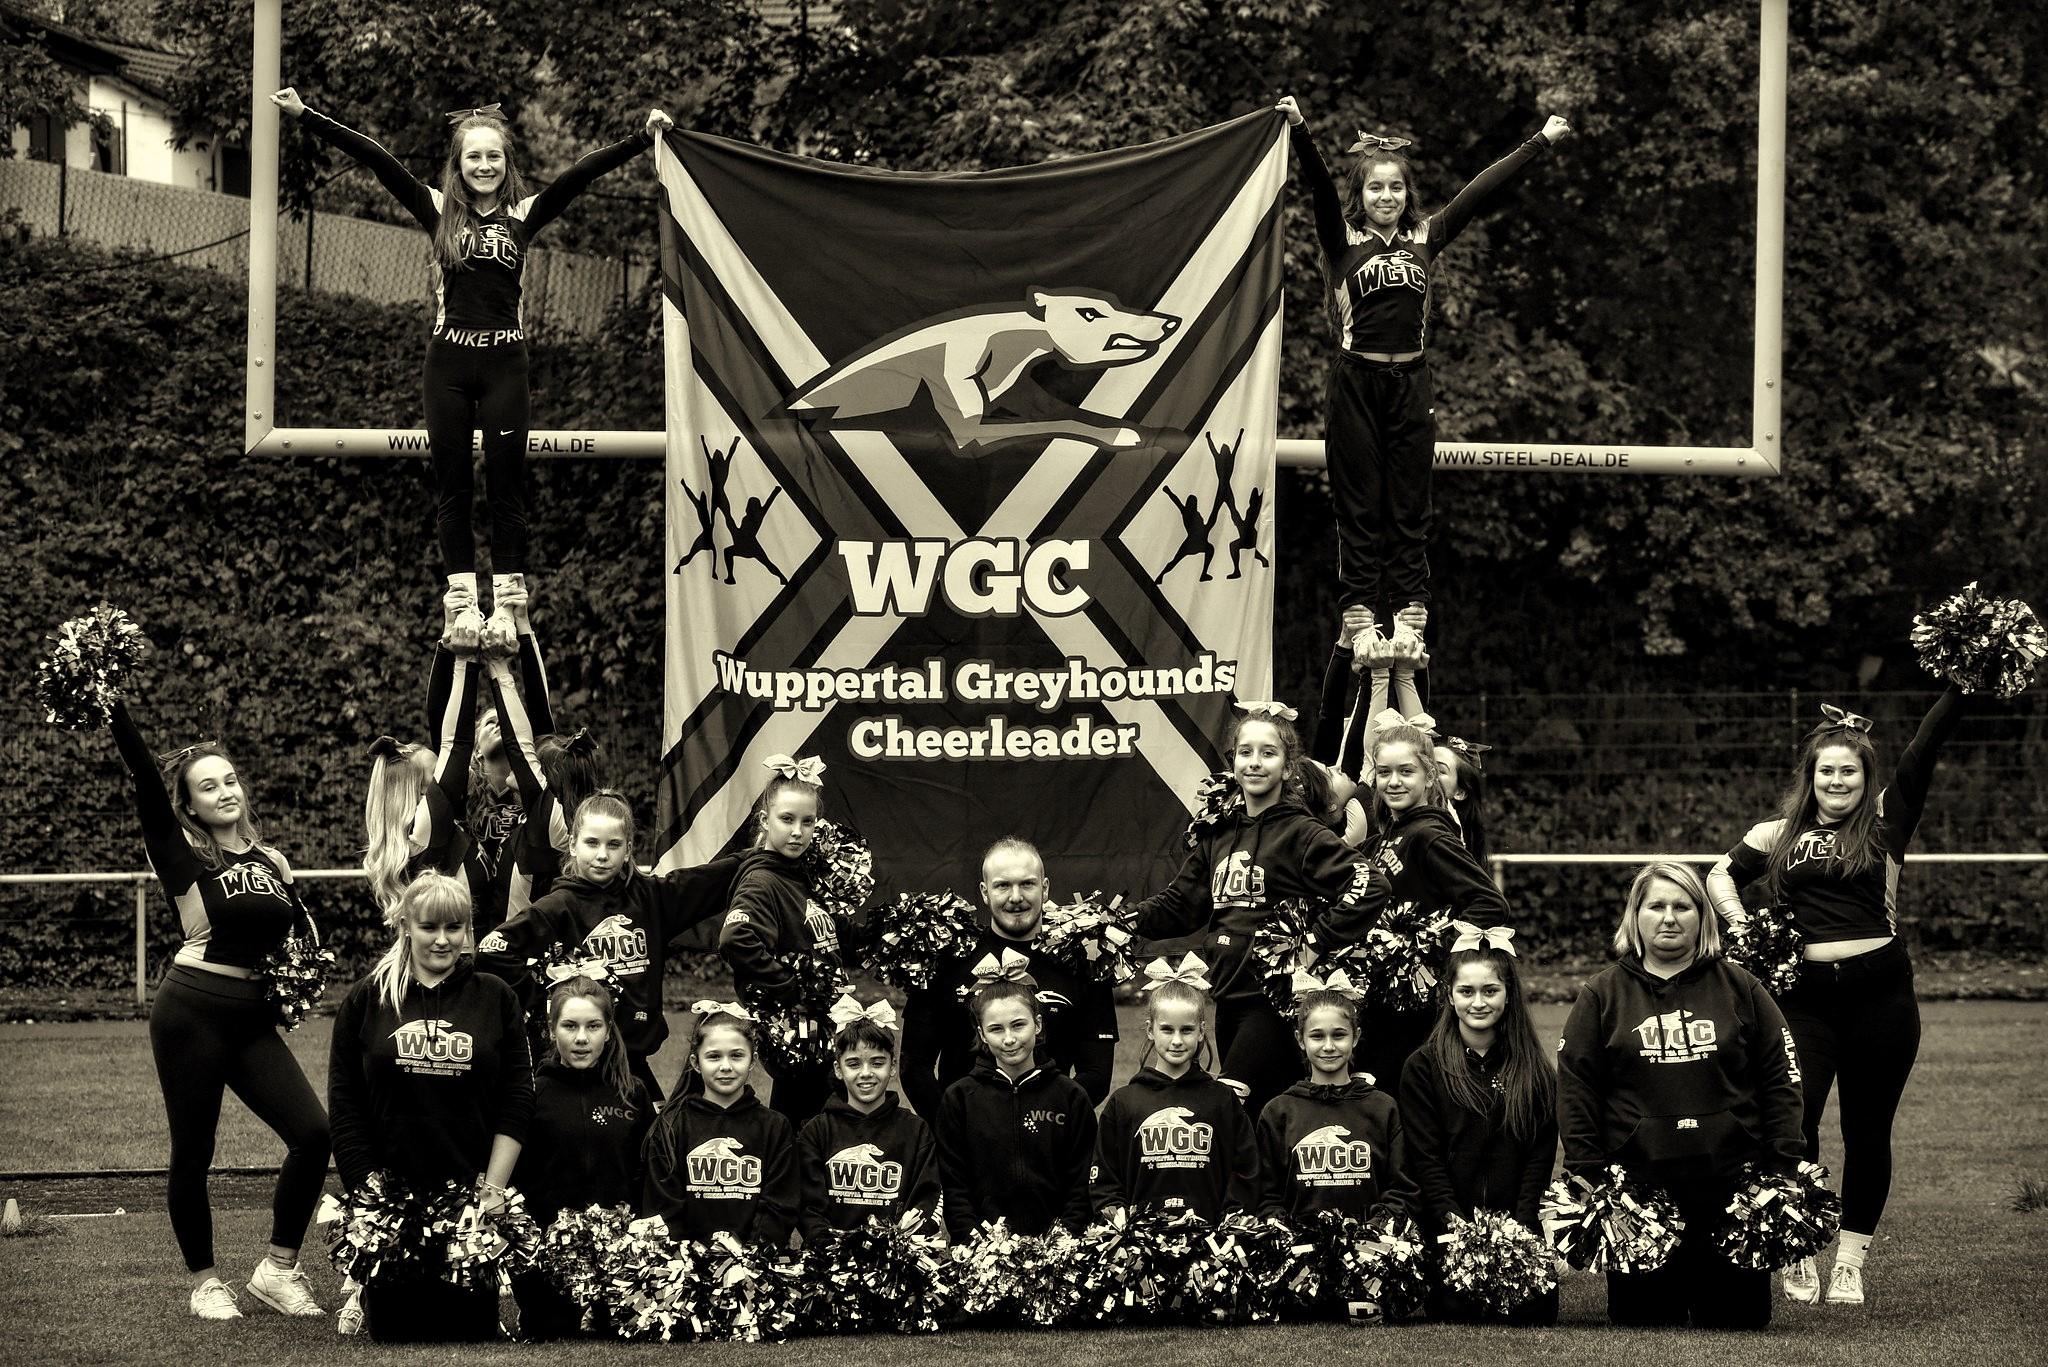 Greyhounds-Cheerleader